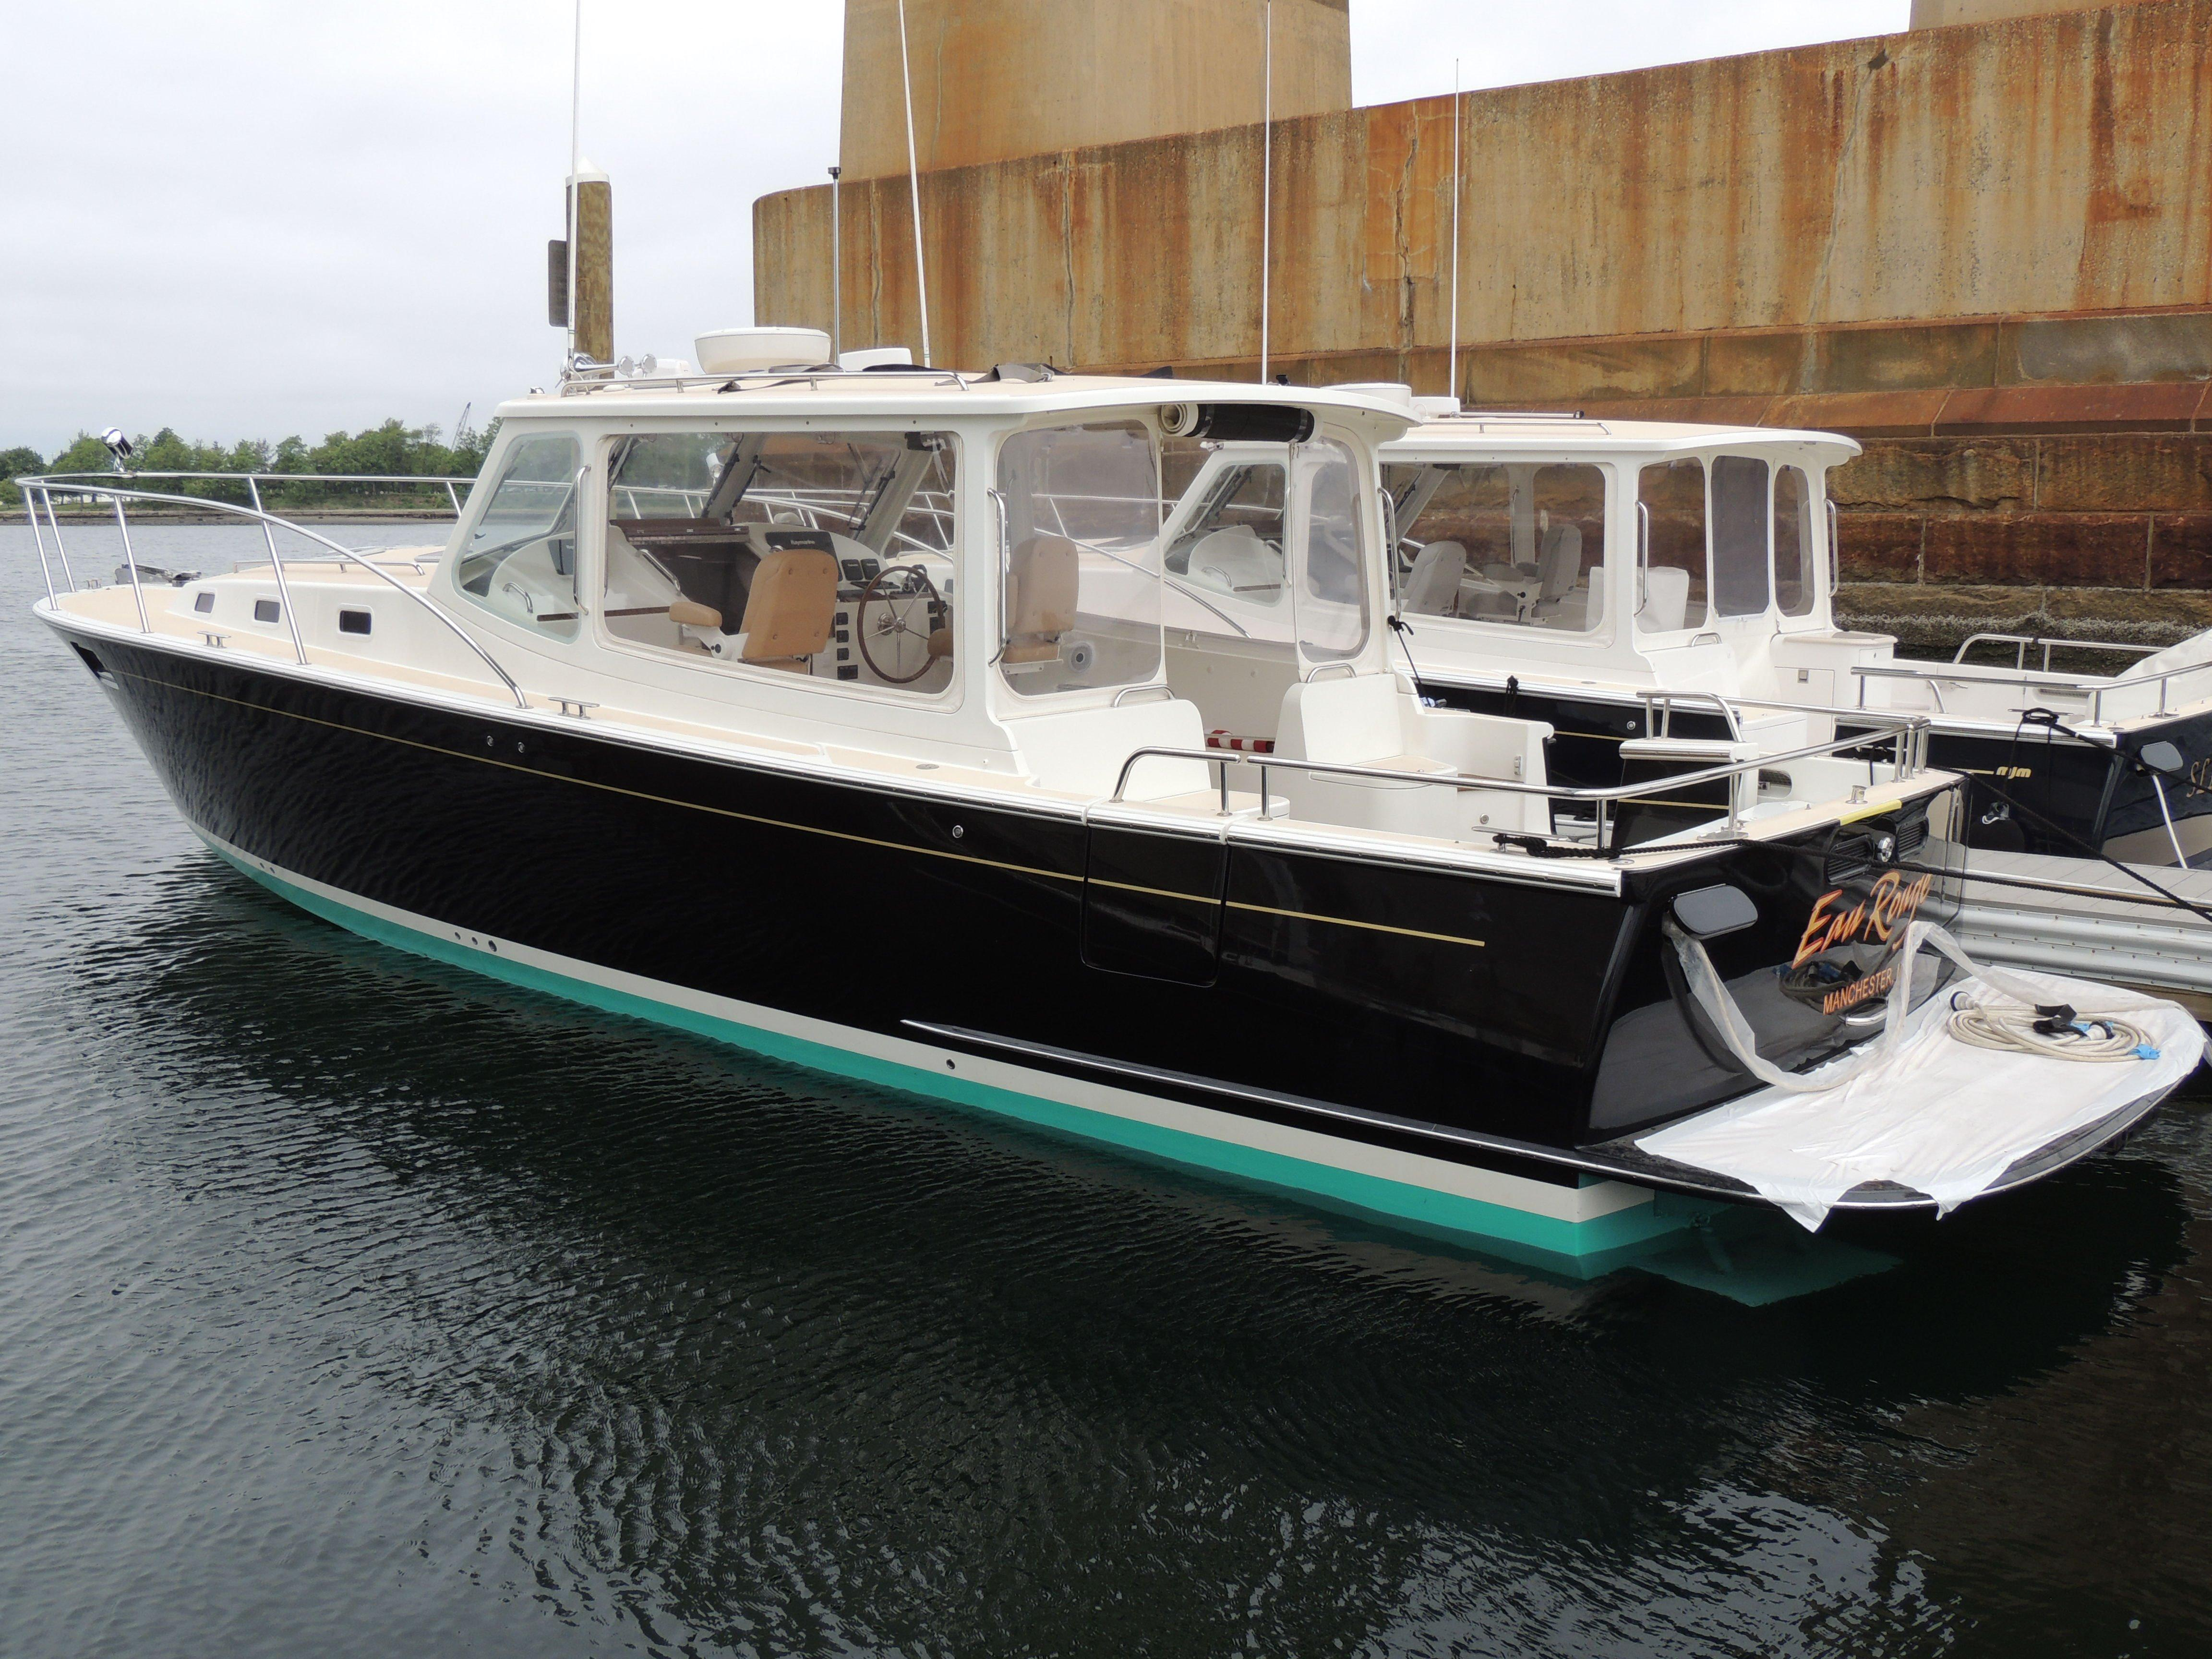 Stonington (CT) United States  city photo : 2012 MJM 40z Downeast Power Boat For Sale www.yachtworld.com